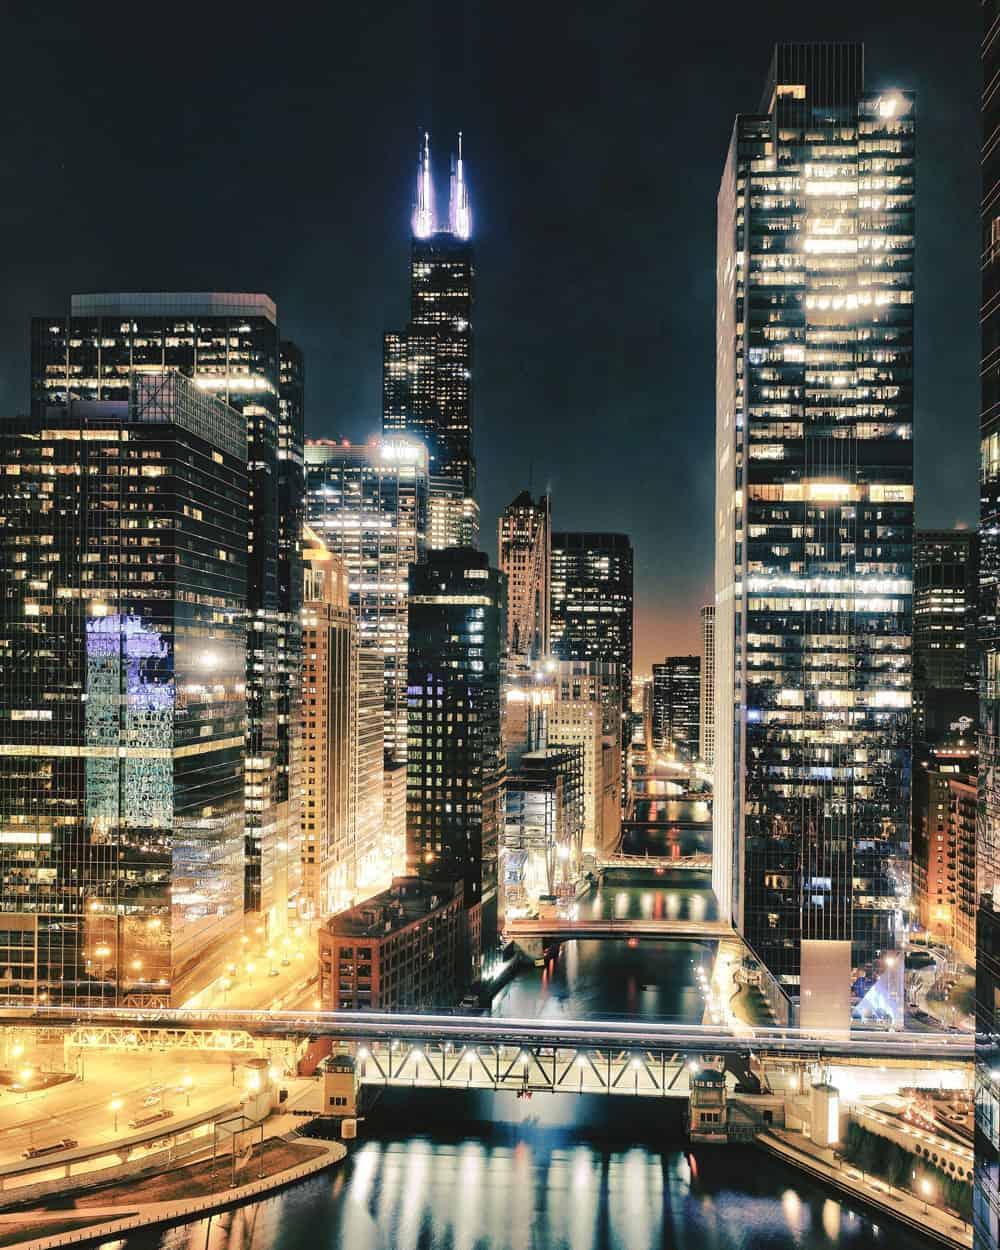 Night cityscape photography